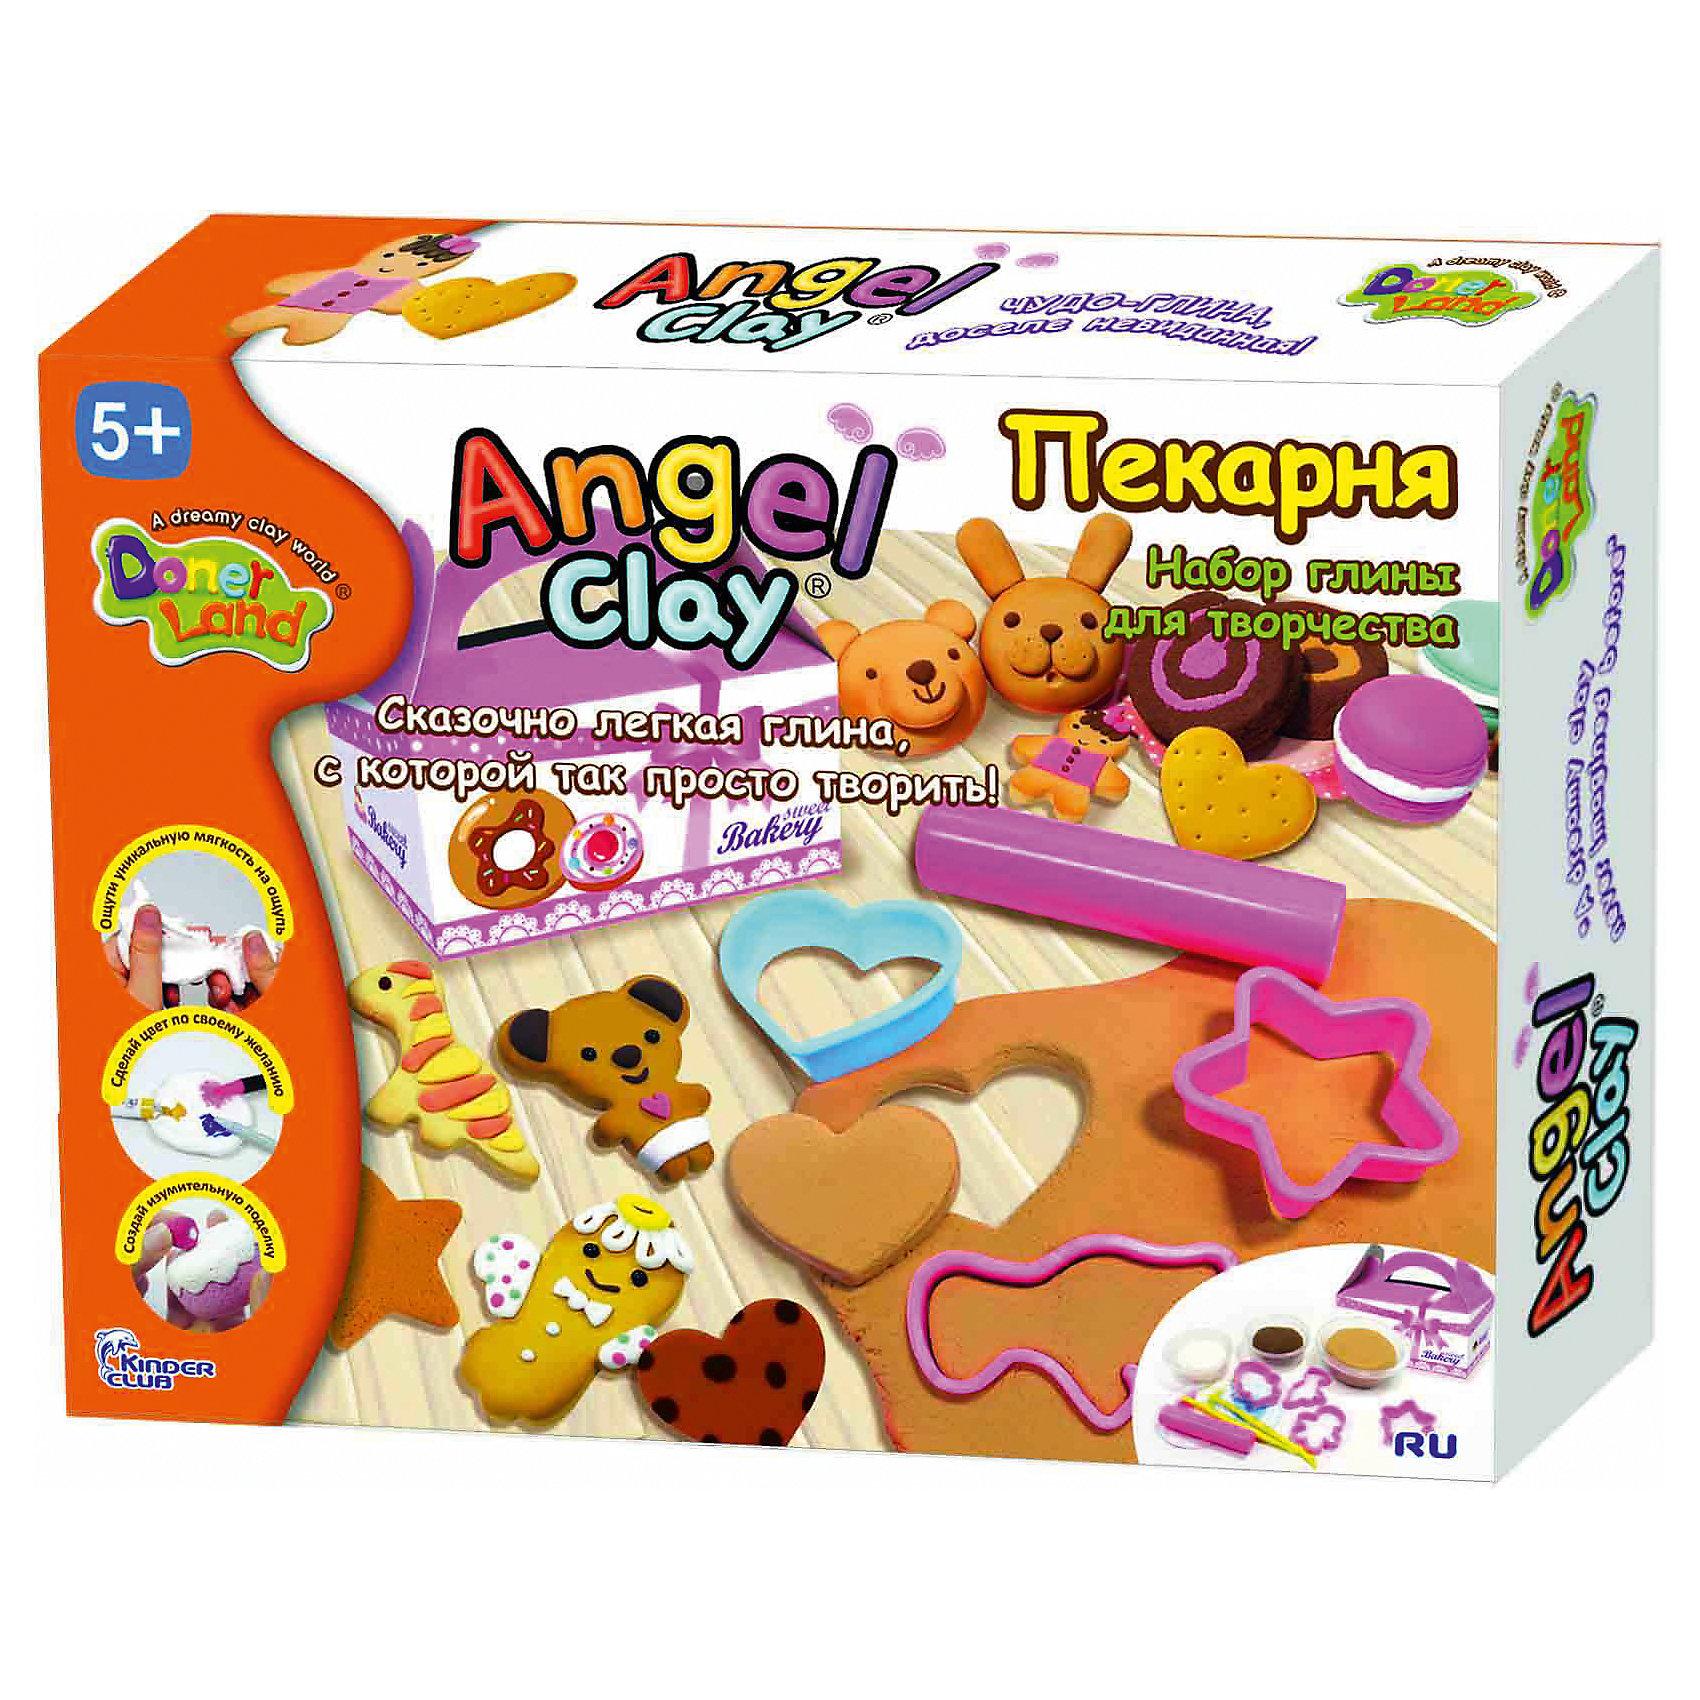 Angel Clay Игровой набор для лепки из глины  Пекарня, Angel Clay набор для лепки donerland angel clay funny safari aa14021